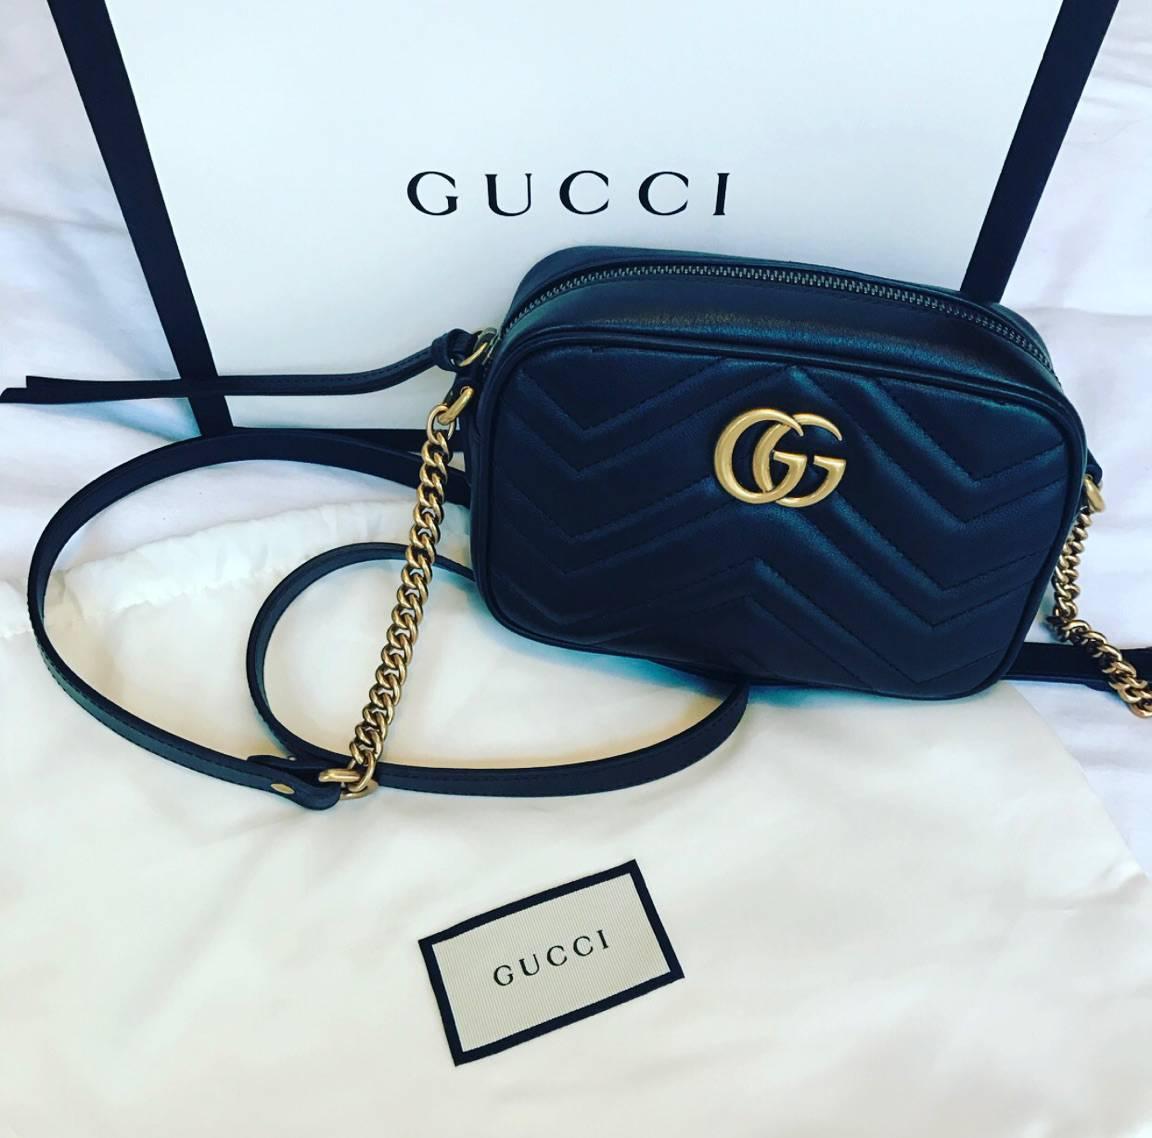 b5eeaa0950fe Gucci GG Marmont Matelassé Mini Handbag Unboxing